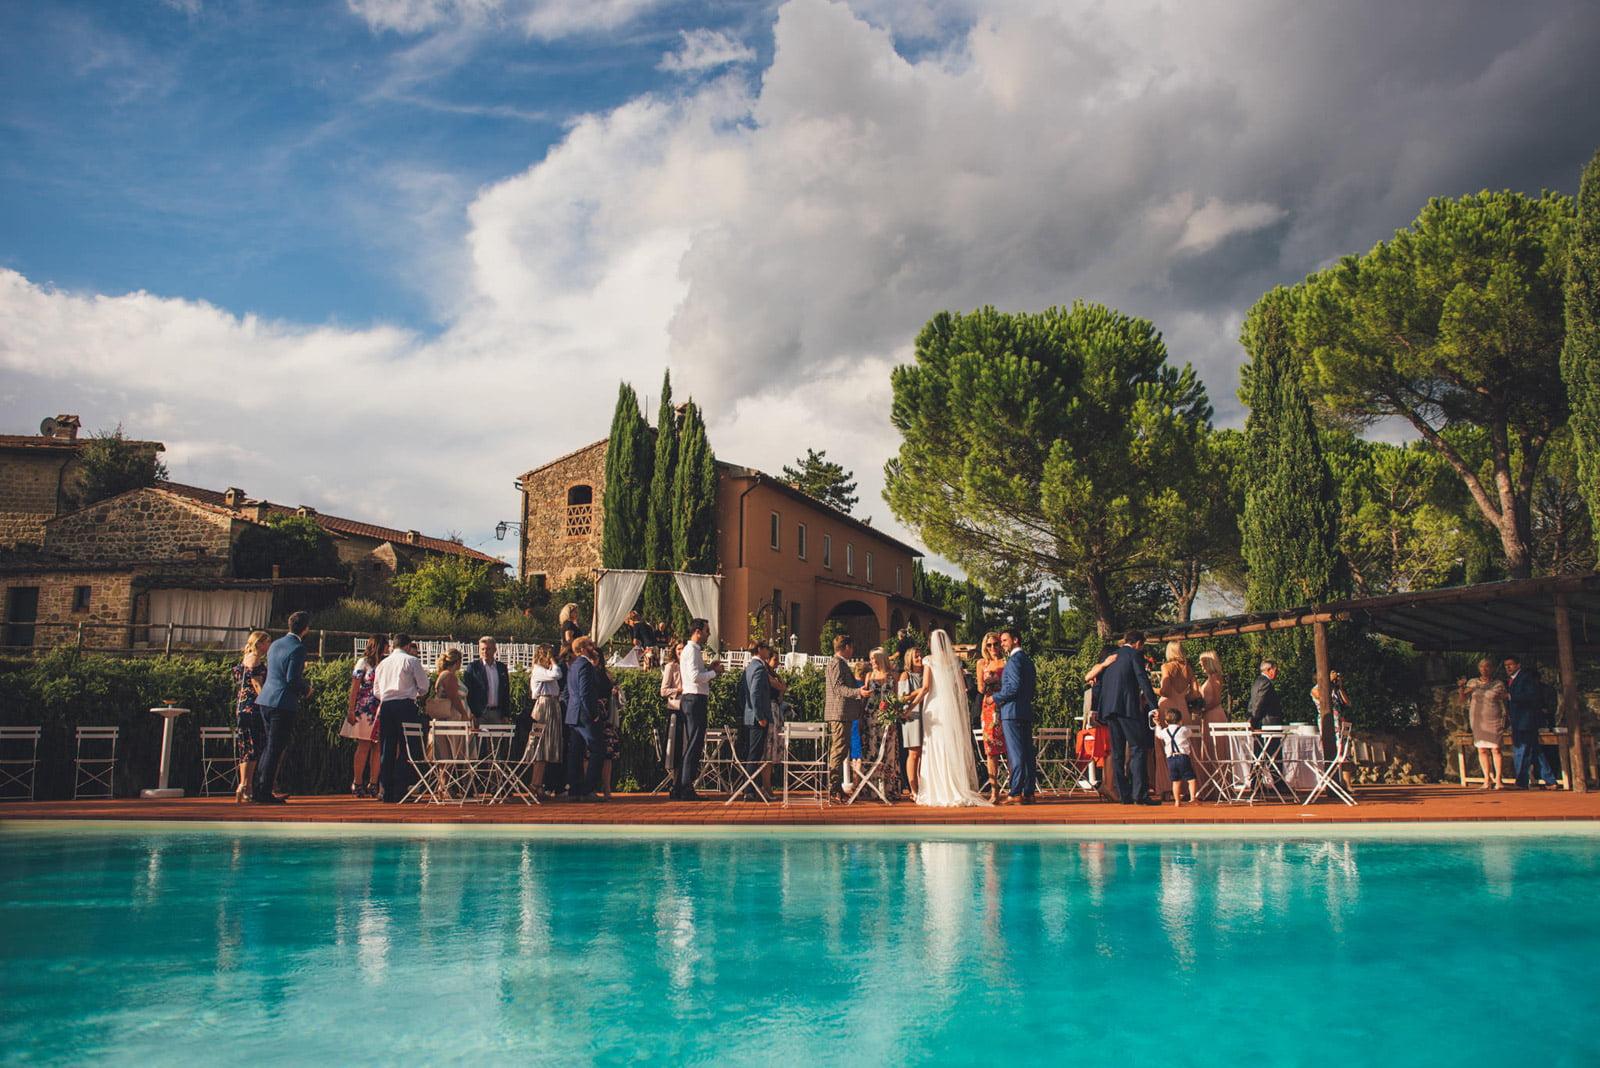 070-wedding-tuscany-san-galgano-federico-pannacci-photographer